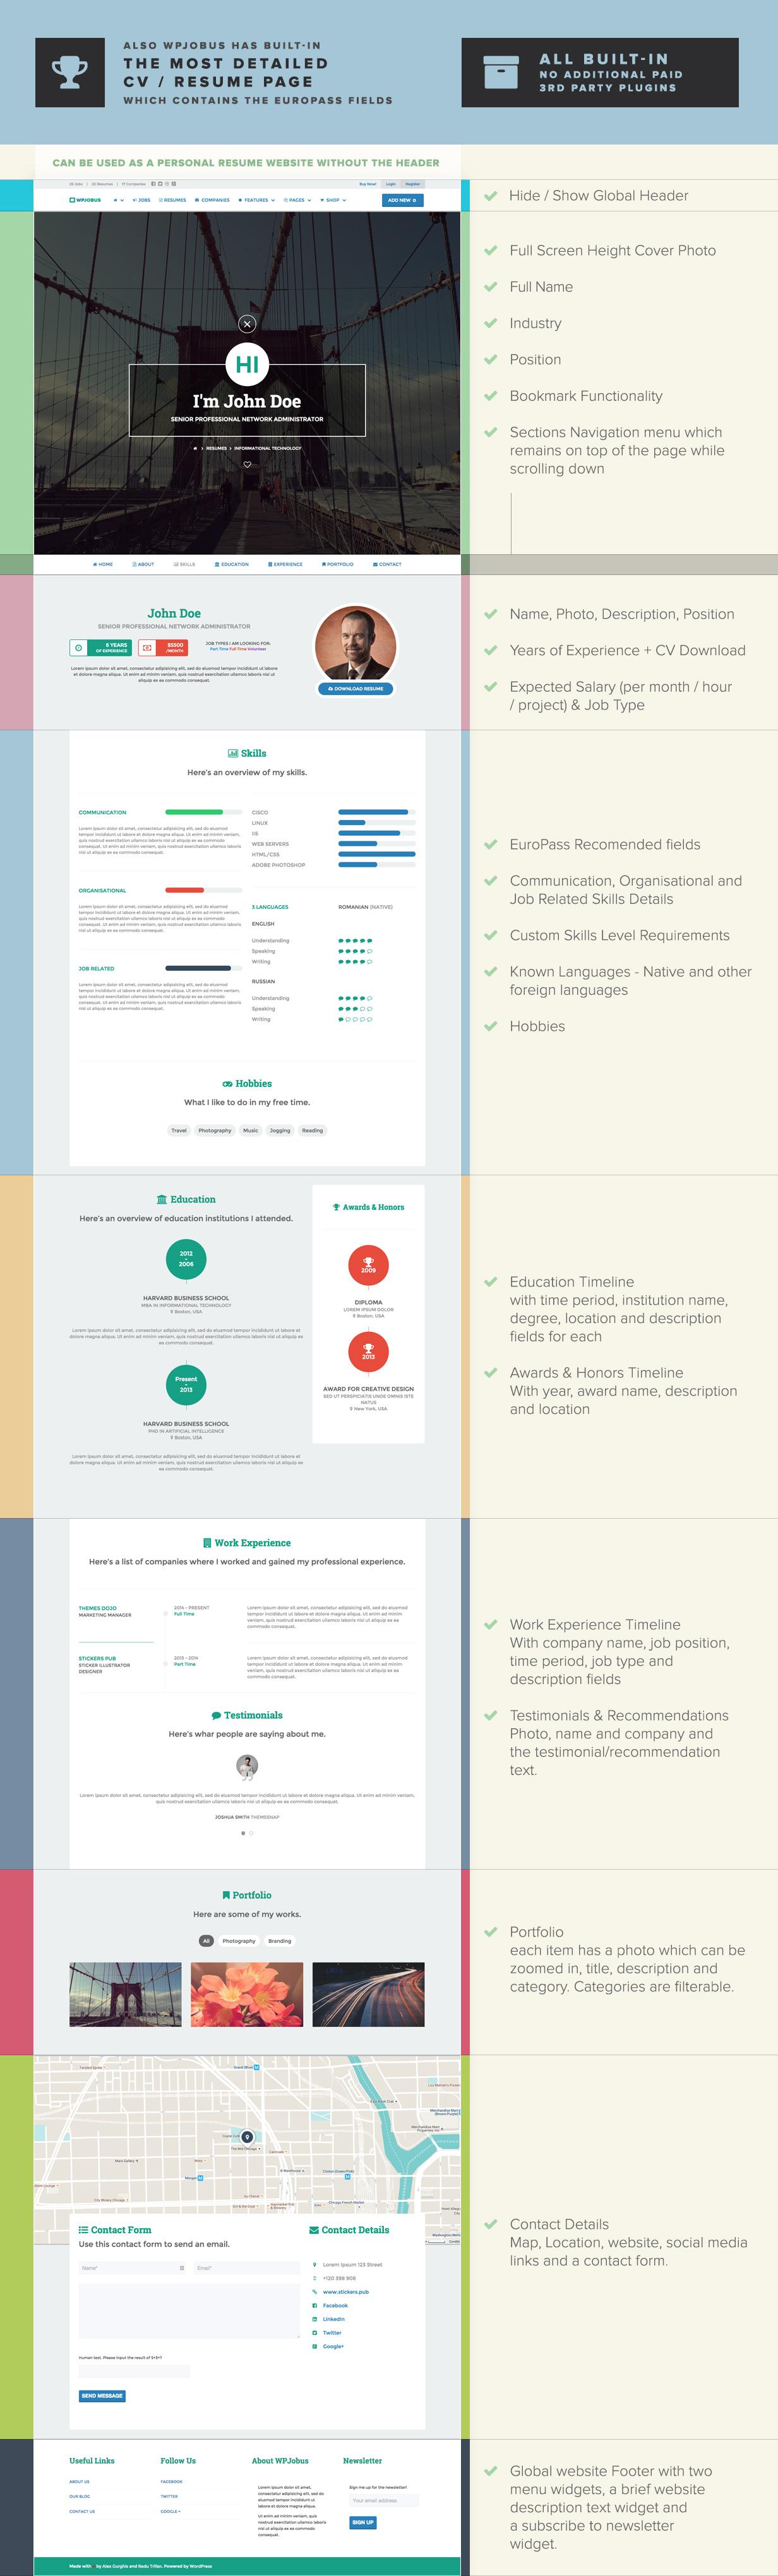 WPJobus - Job Board and Resumes WordPress Theme - 8